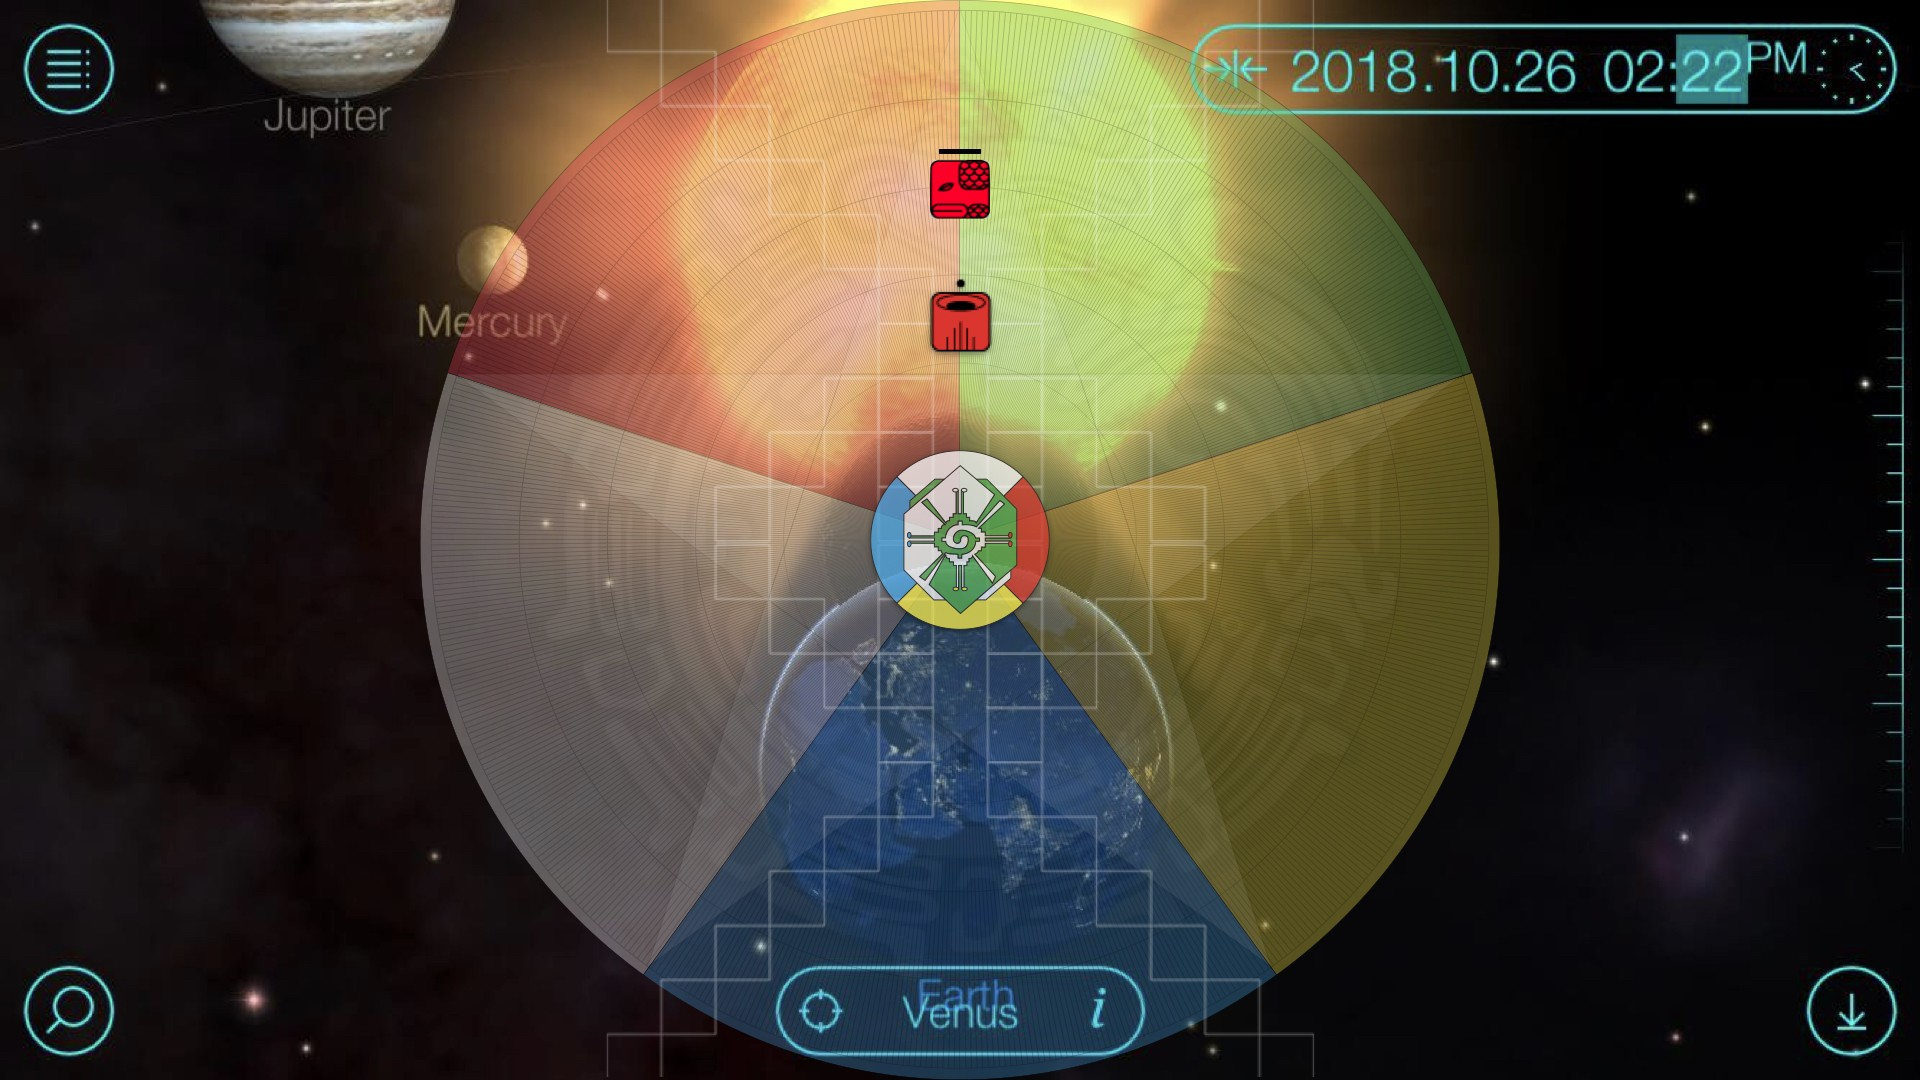 Calendario Lunar Zodiaco 2019 Recientes Noospheric Emergence Part Phive the Venus Factor – tortuga Of Calendario Lunar Zodiaco 2019 Más Recientes V 2019 02 13 S